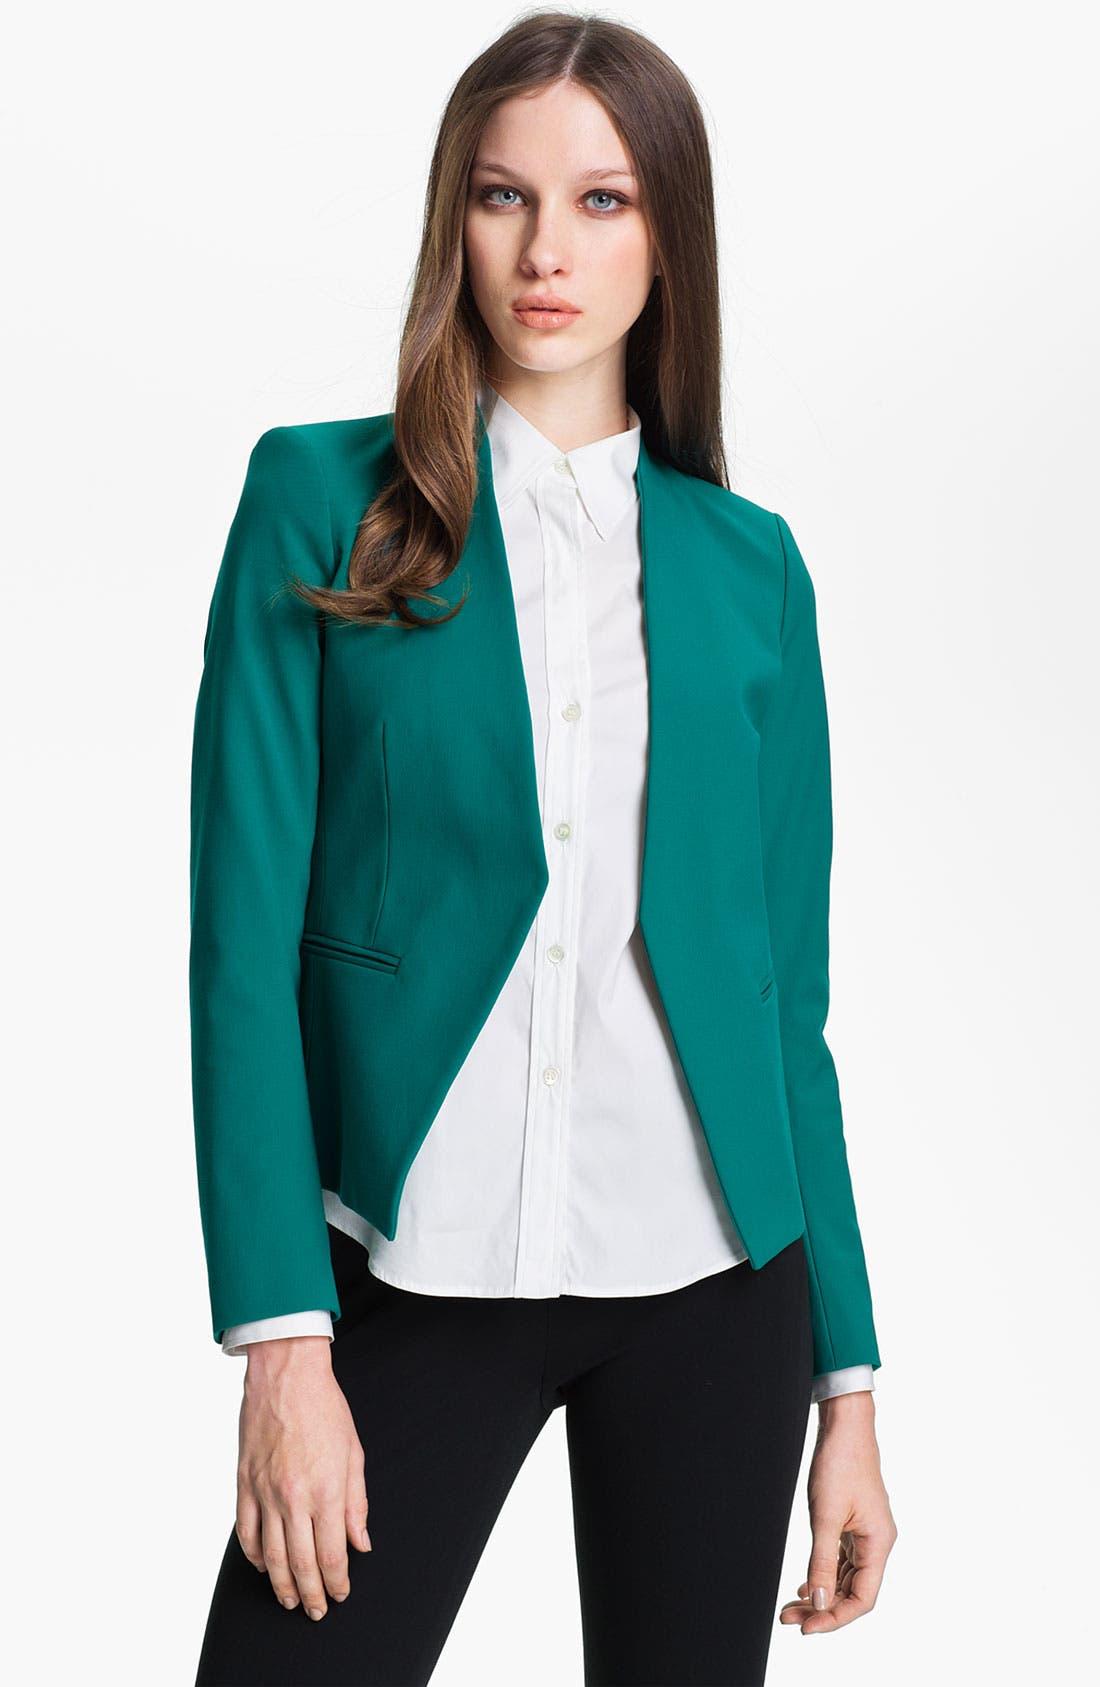 Alternate Image 1 Selected - Theory 'Lanai' Twill Jacket